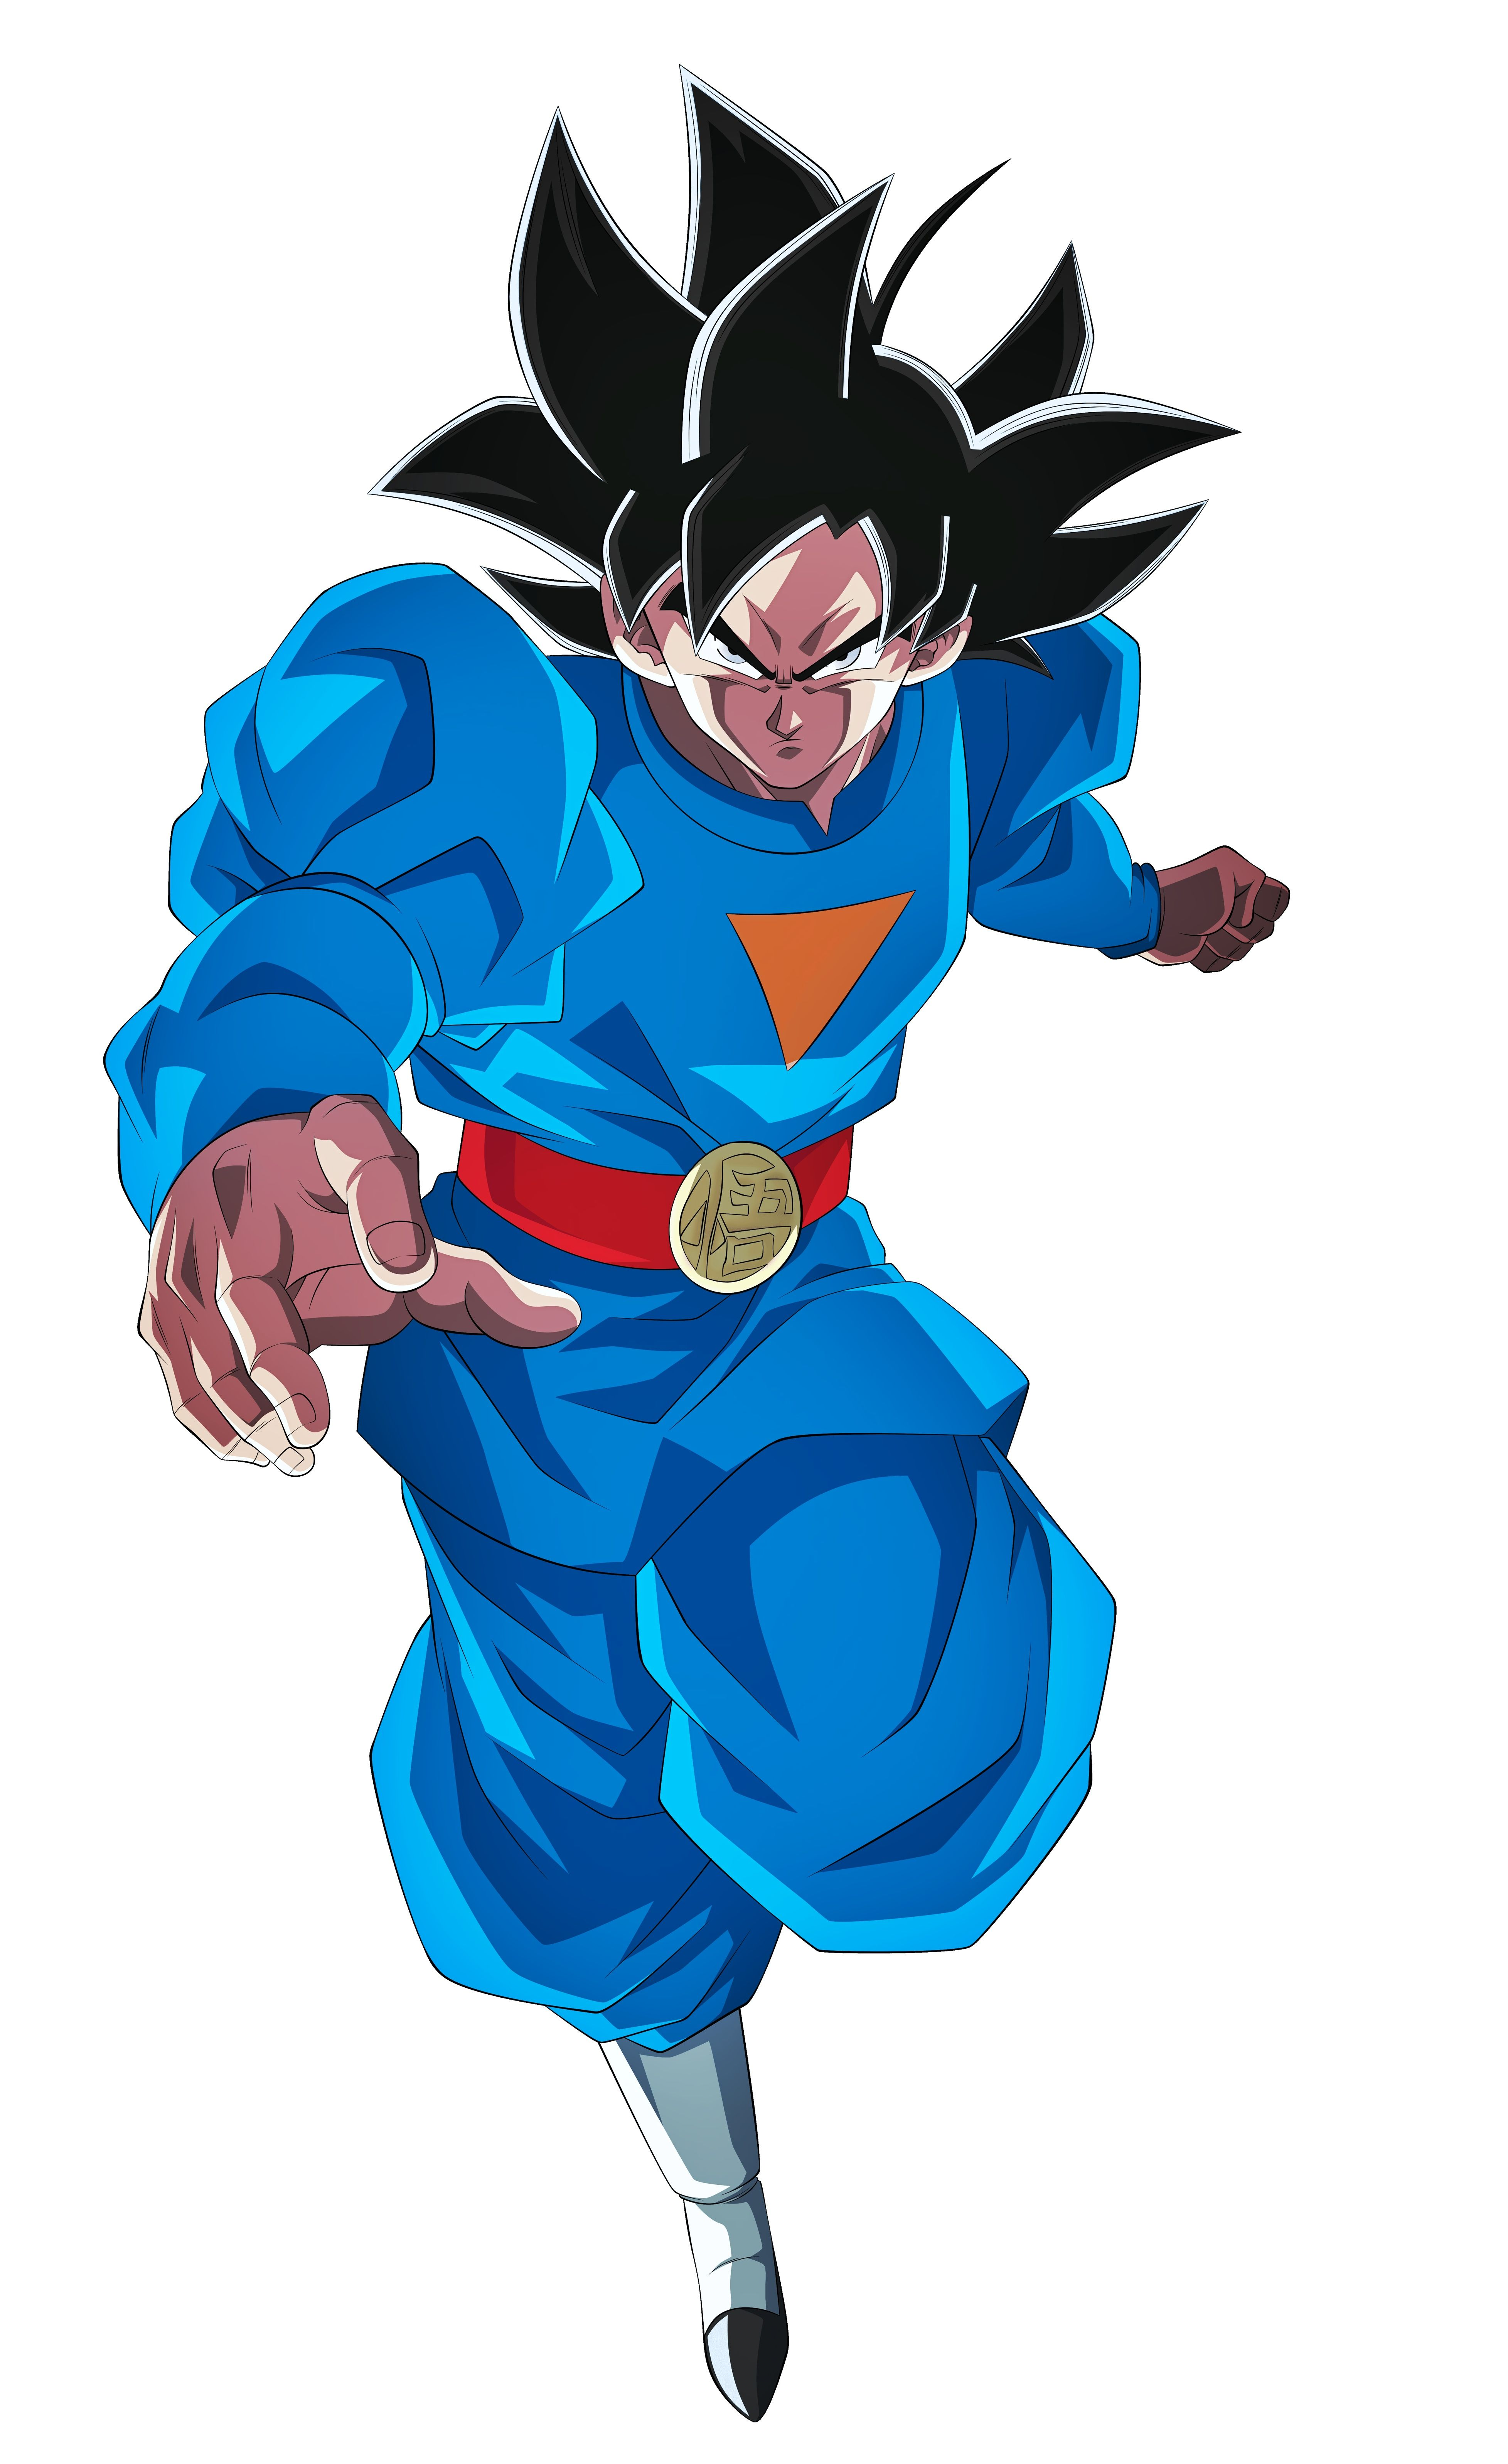 Goku Ultra Instinto (Universo 7) Anime dragon ball super